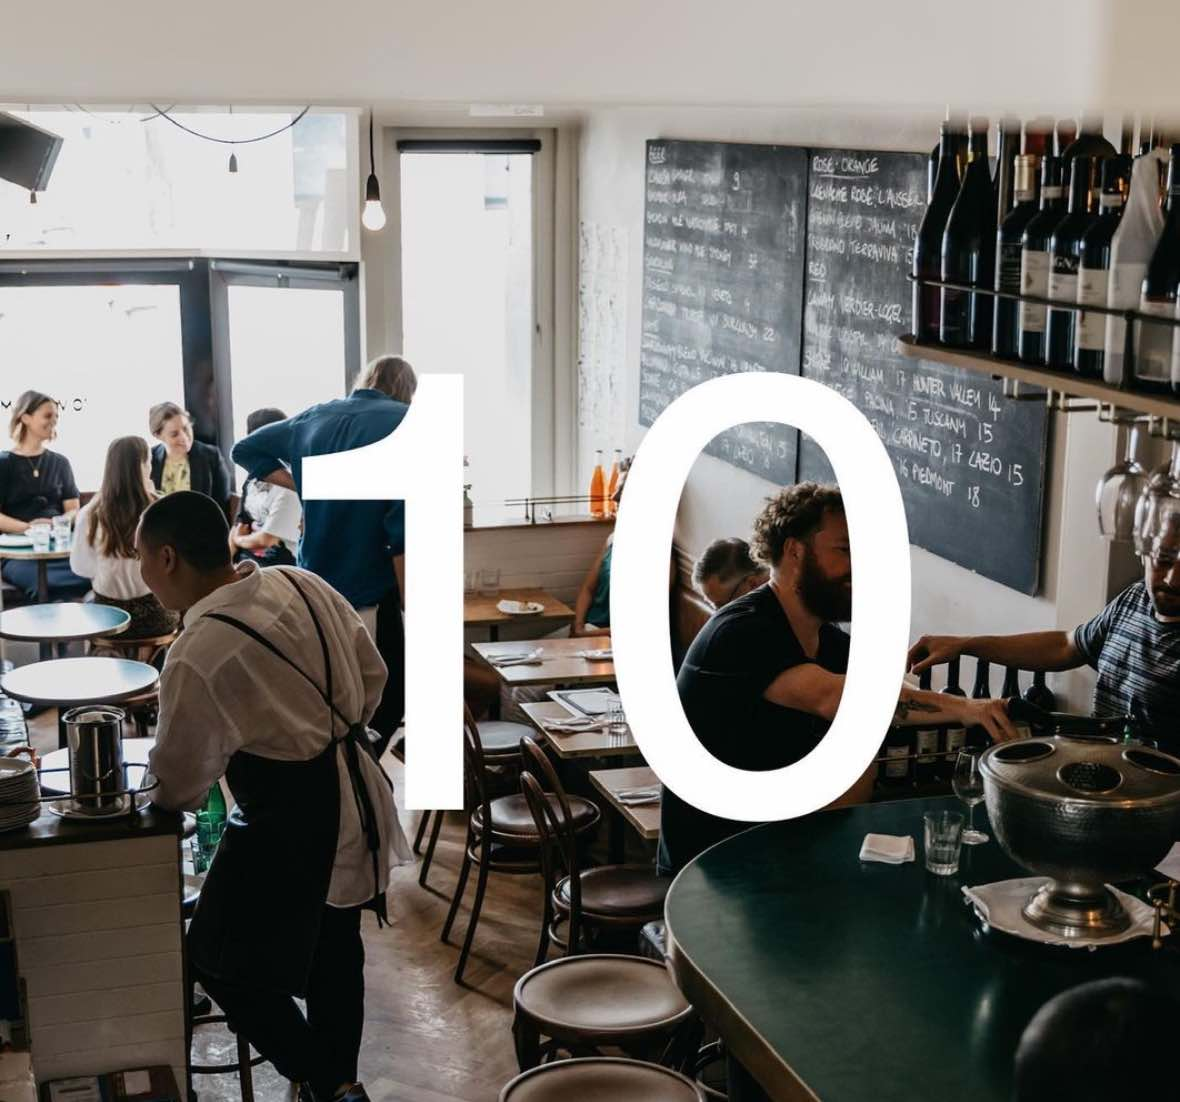 10 william street - covid friendly restaurants in sydney